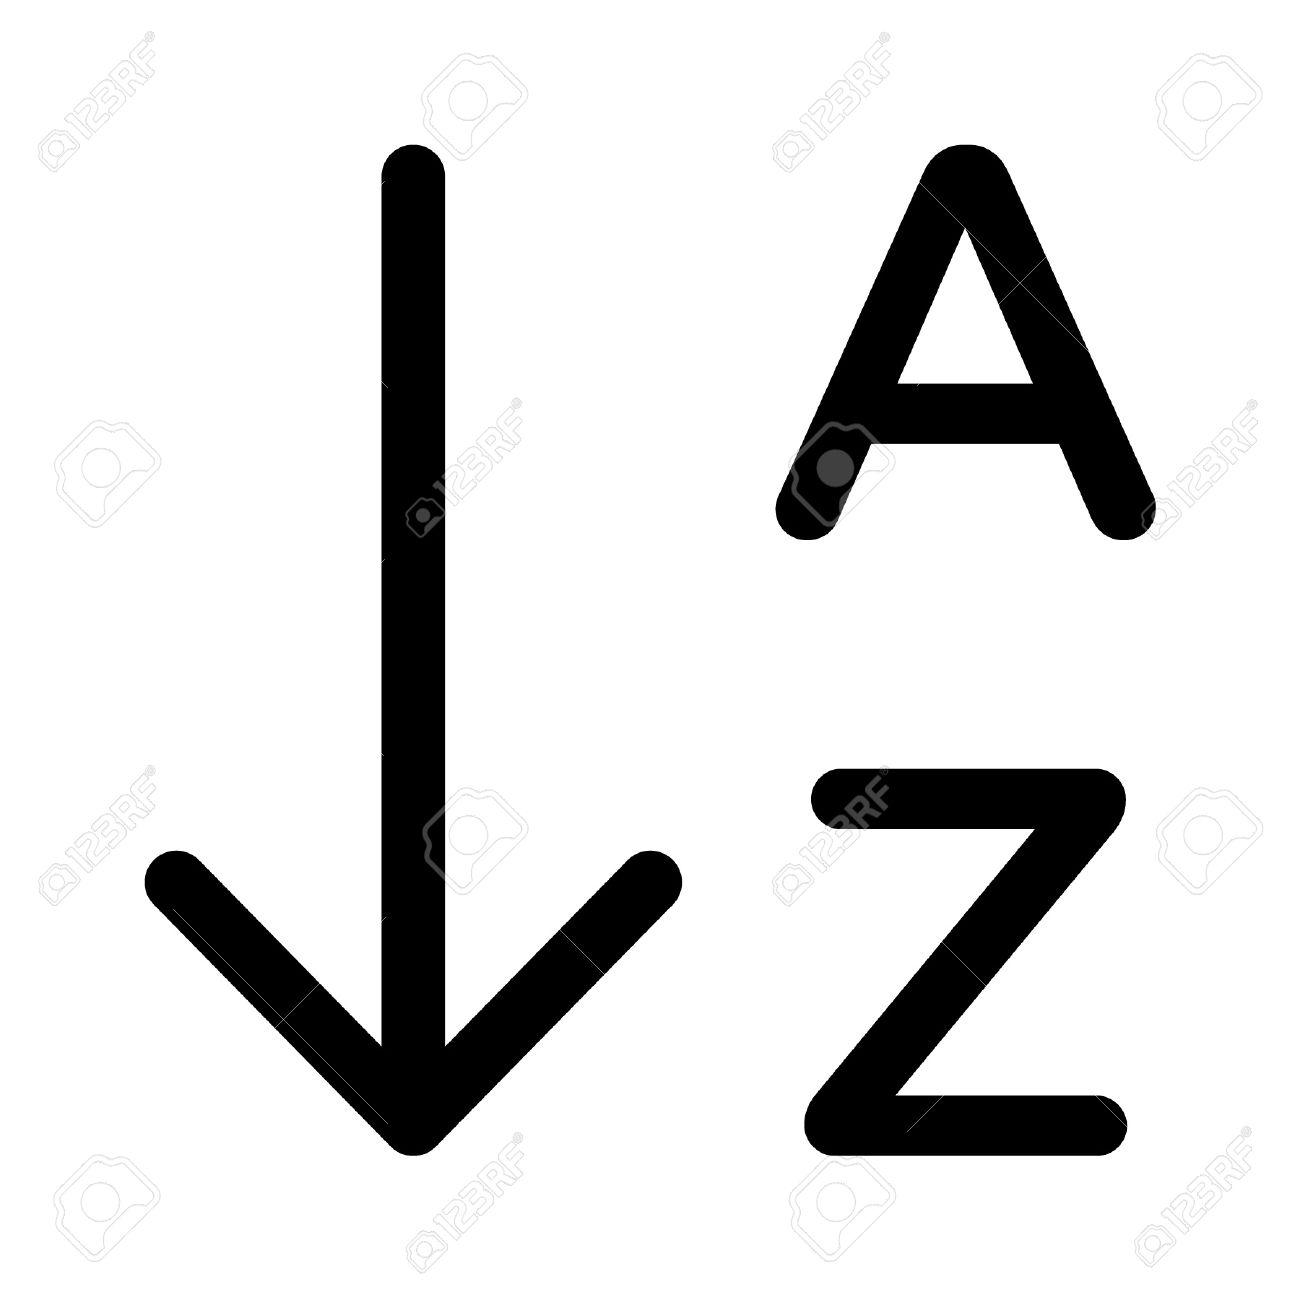 sort by alphabetical order list line art icon for apps and sort by alphabetical order list line art icon for apps and websites stock vector 42621252